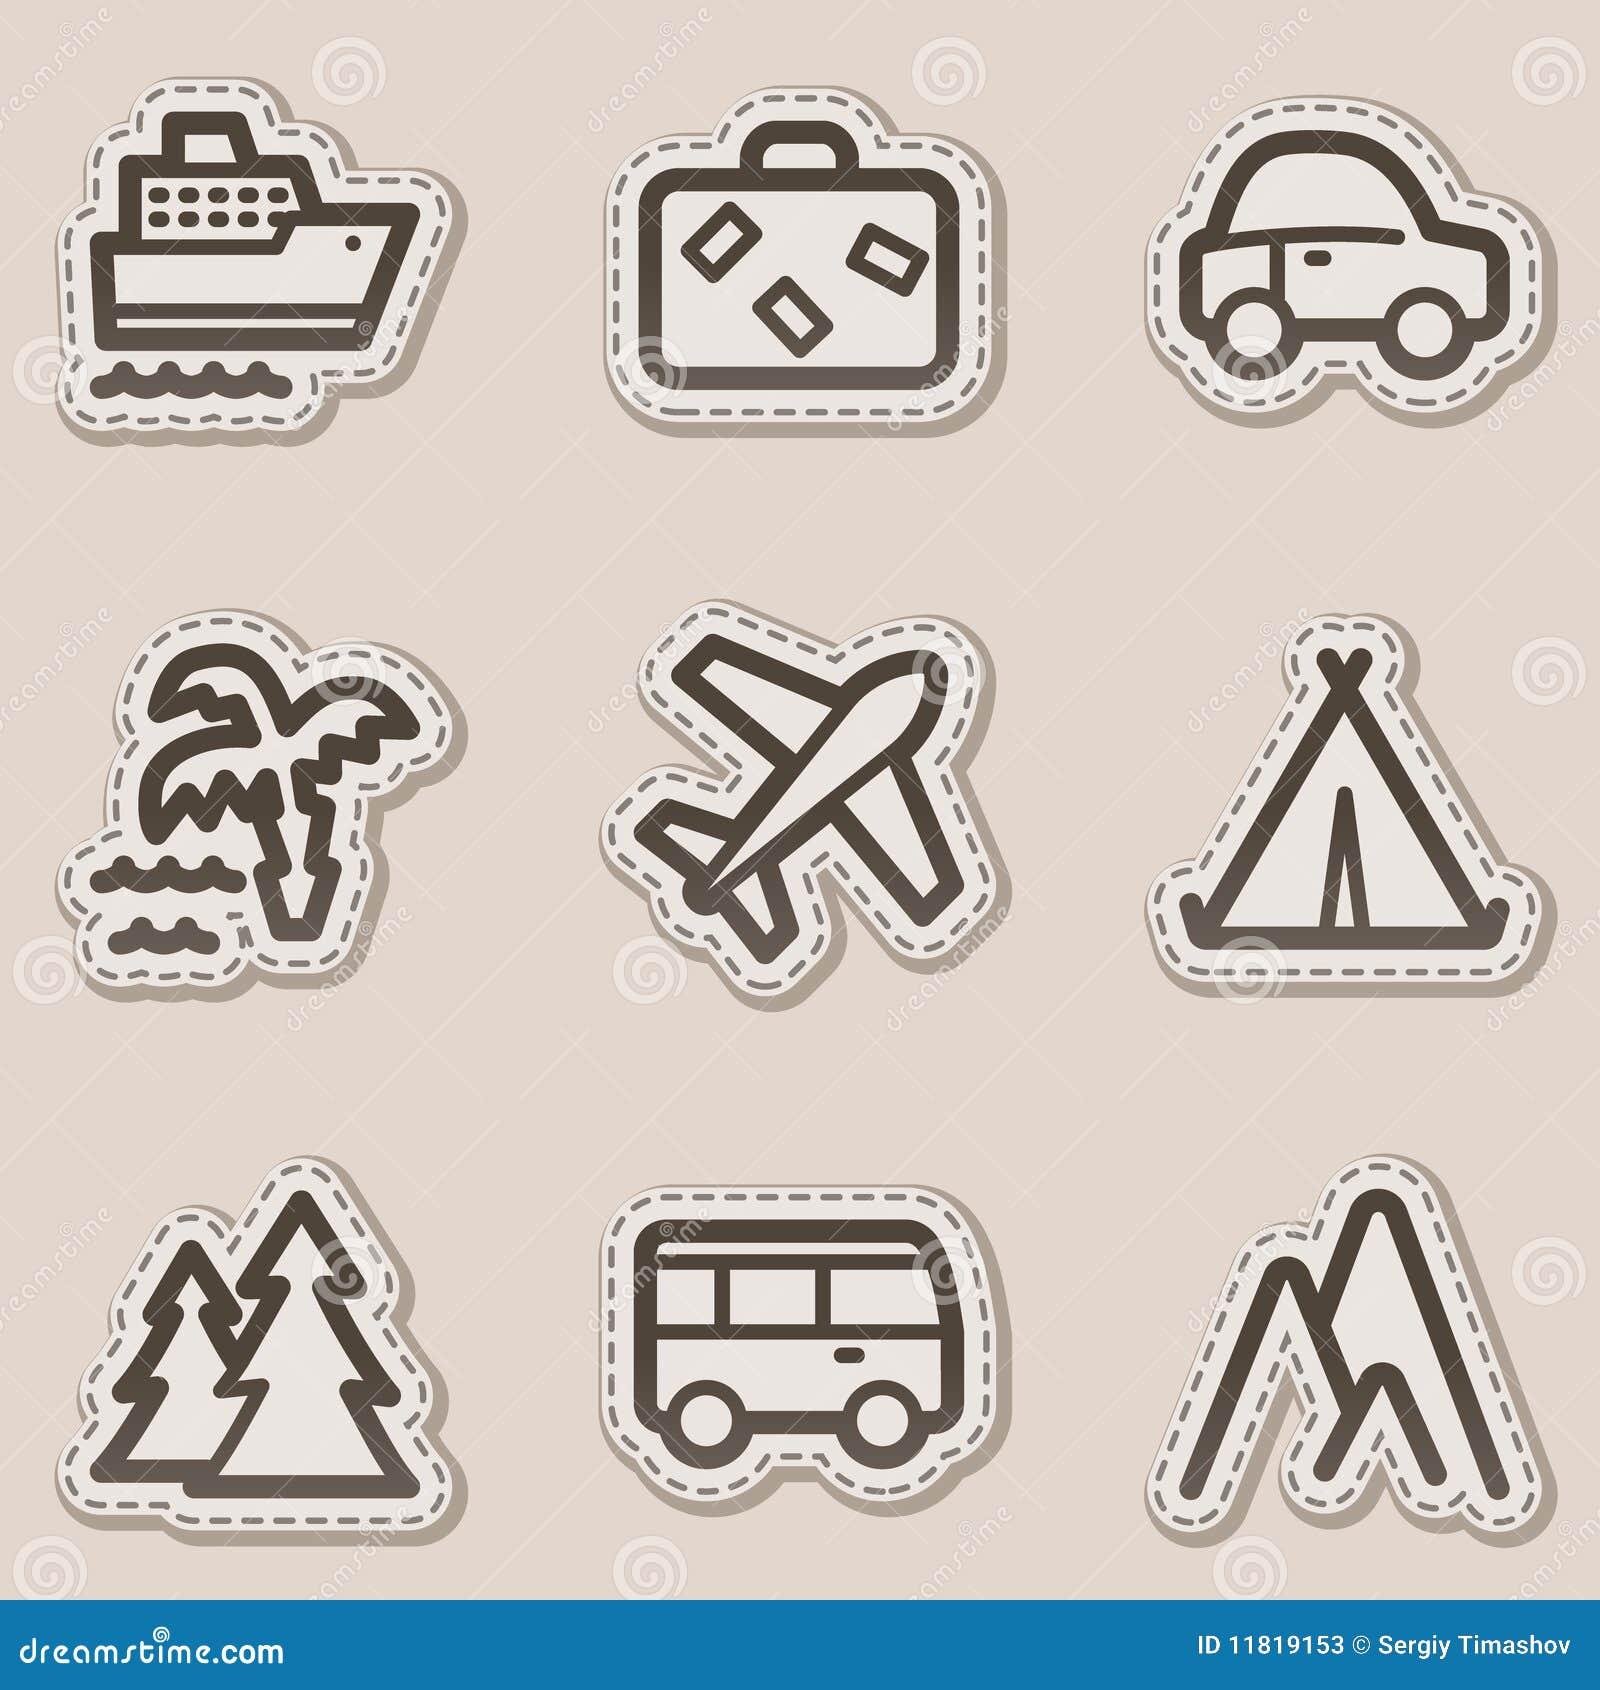 Travel web icons set 1, brown contour sticker